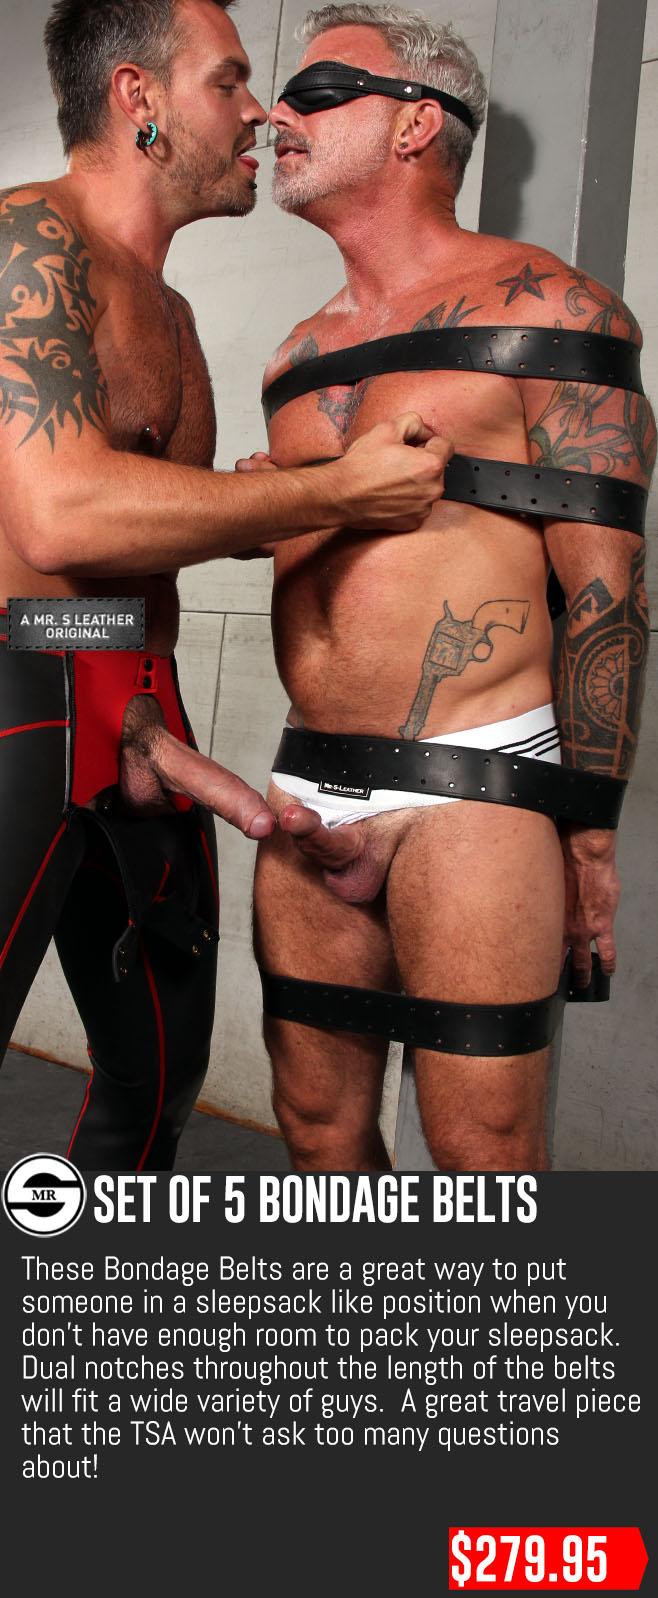 bondage belts